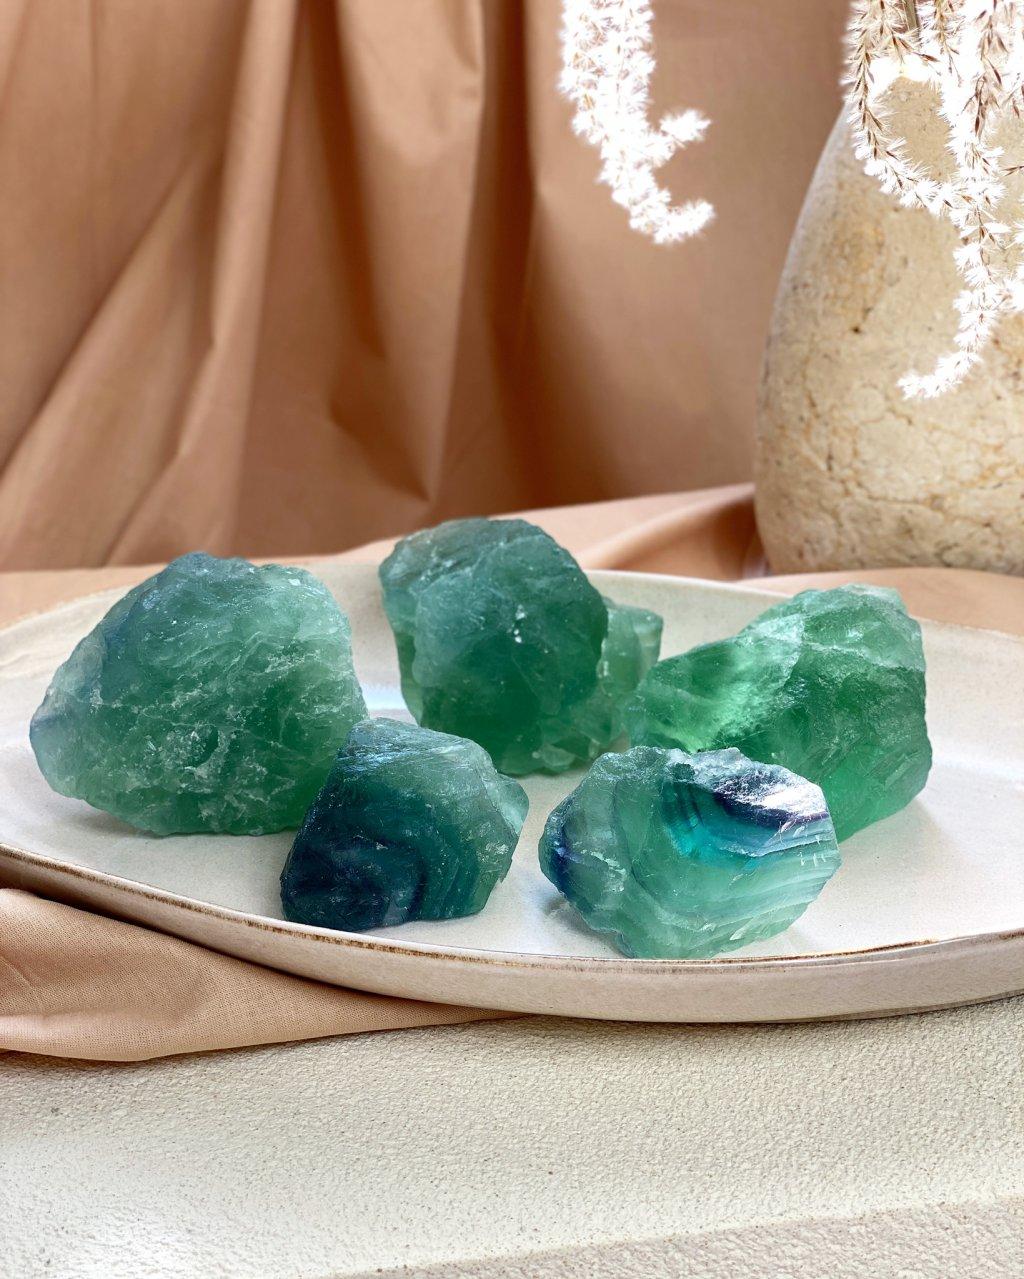 Fluorit modrý surový Čína AAA kvalita 225g